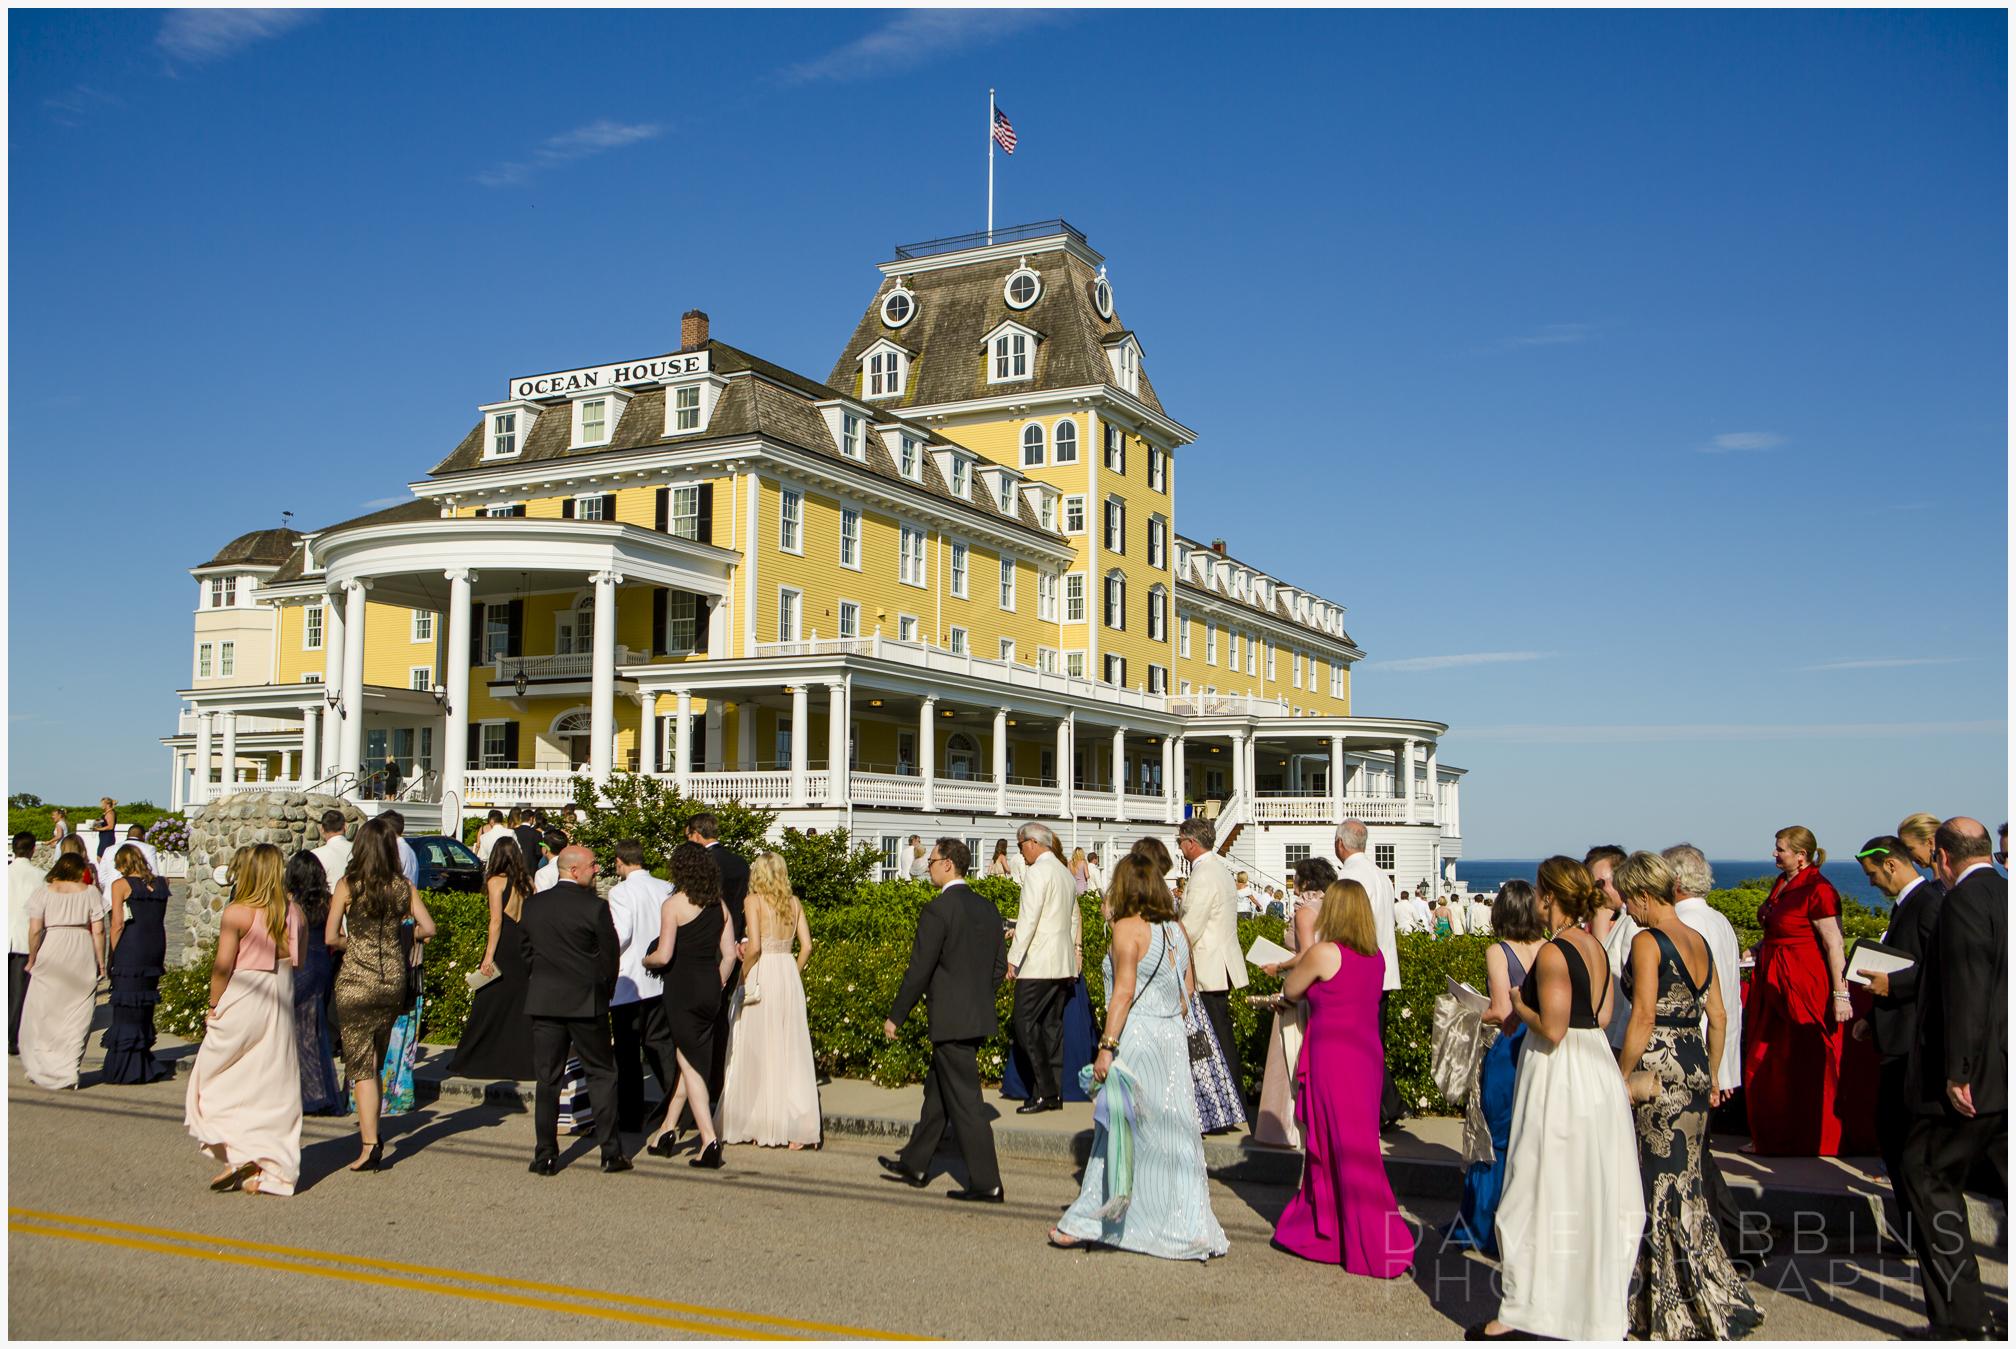 THE OCEAN HOUSE WEDDING 0048.JPG